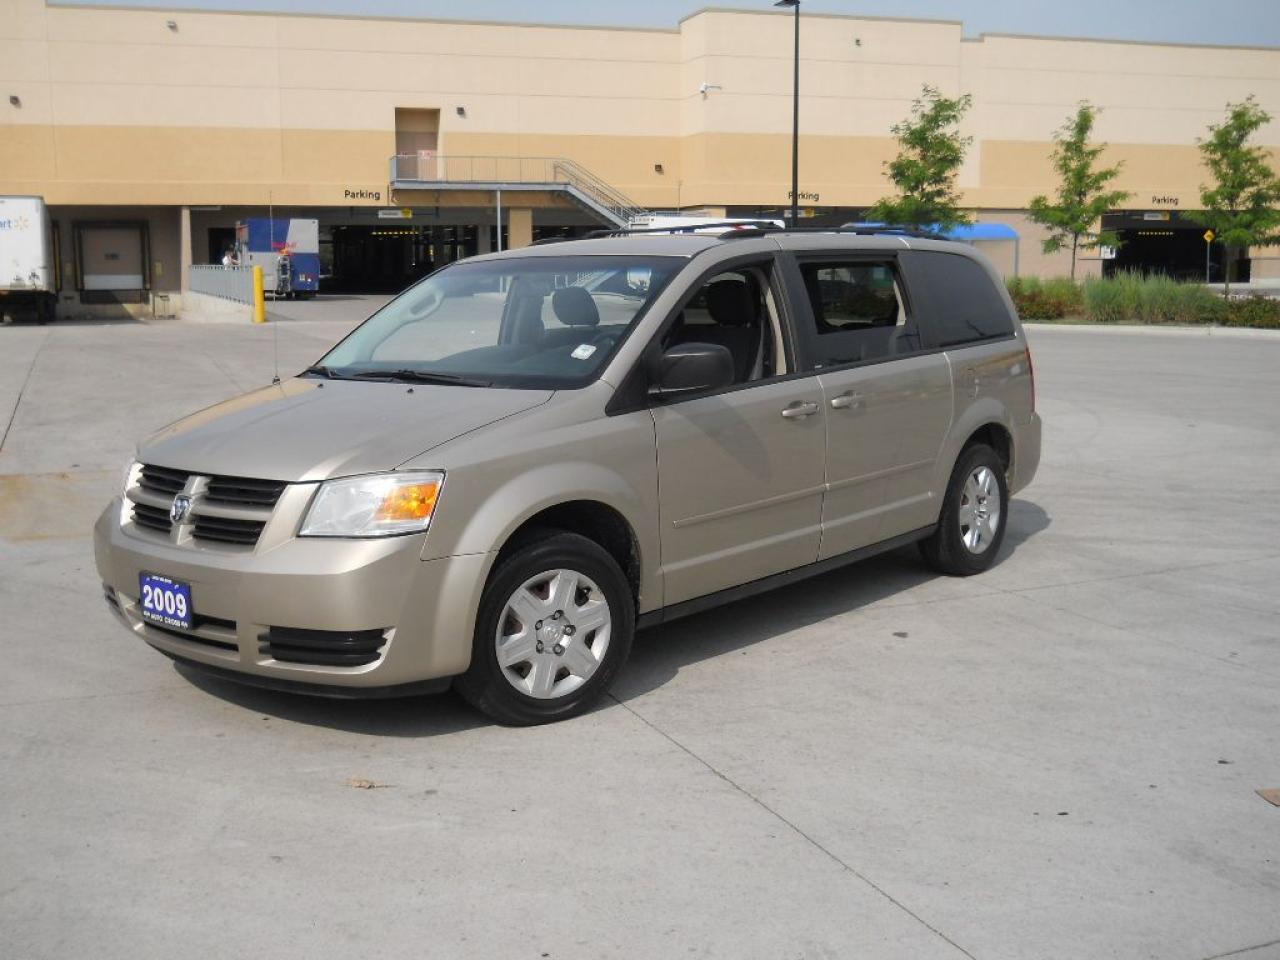 2009 Dodge Grand Caravan Stow & Go, 7 passenger, Automatic, certify, 3